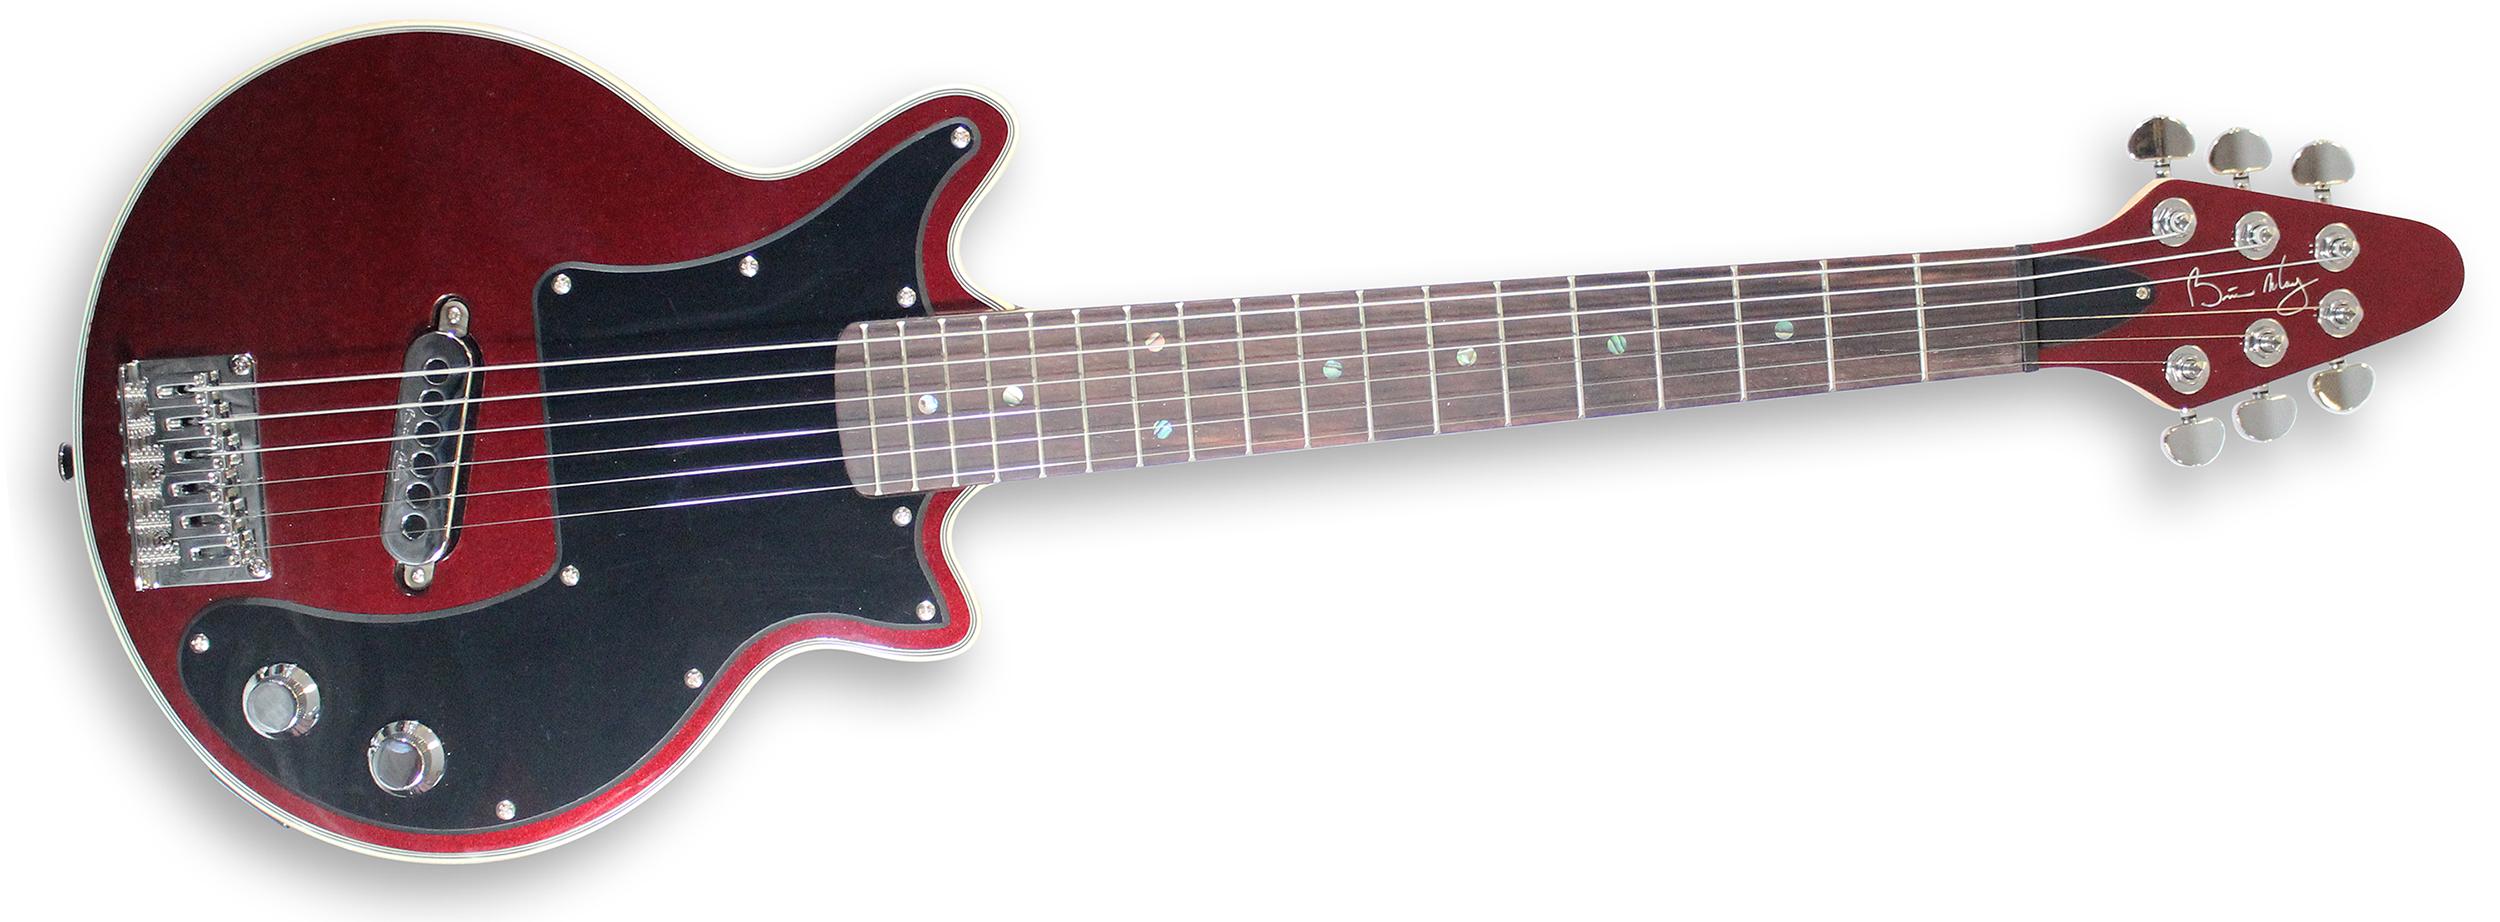 News The Brian May Mini May Returns The Guitar Magazine